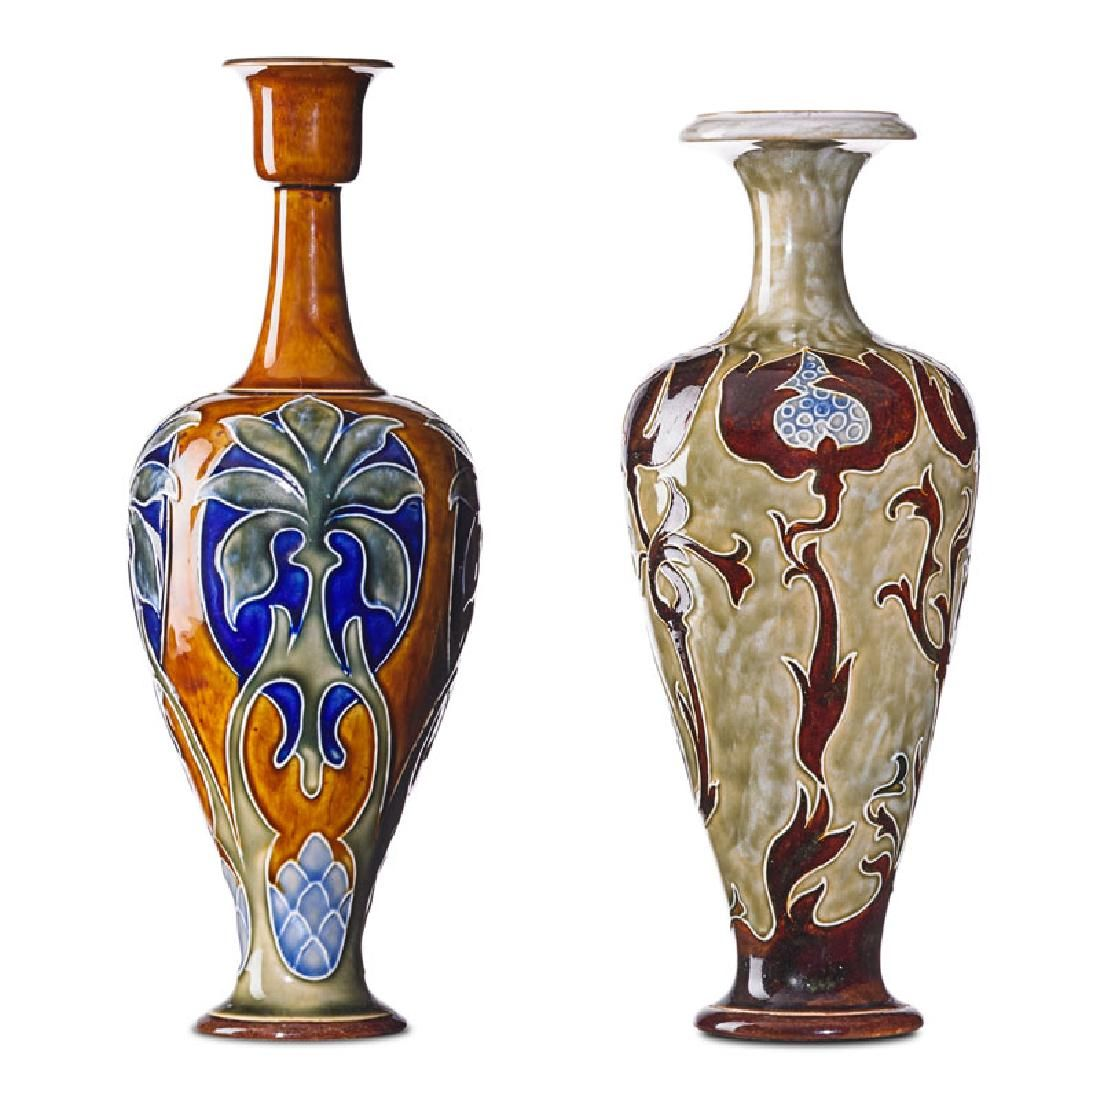 ROYAL DOULTON Two vases